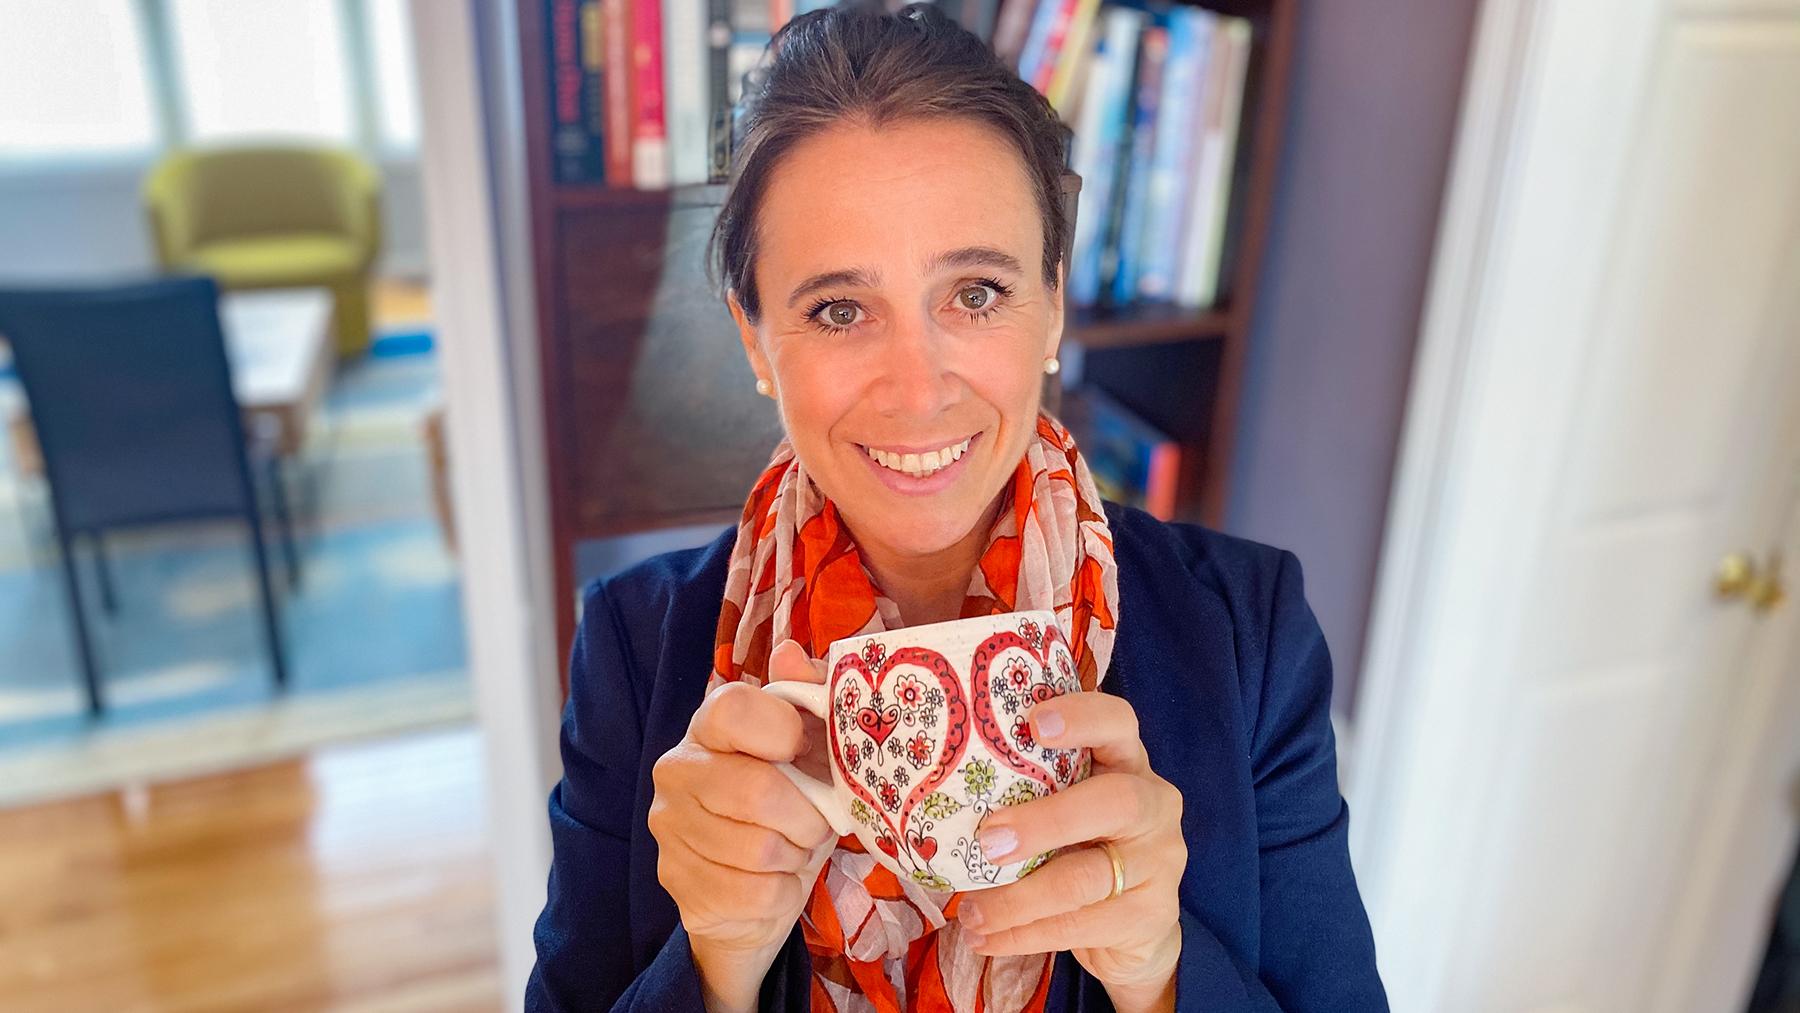 food science and human nutrition professor M. Yanina Pepino found in a study.  Photo by Luka Gruev